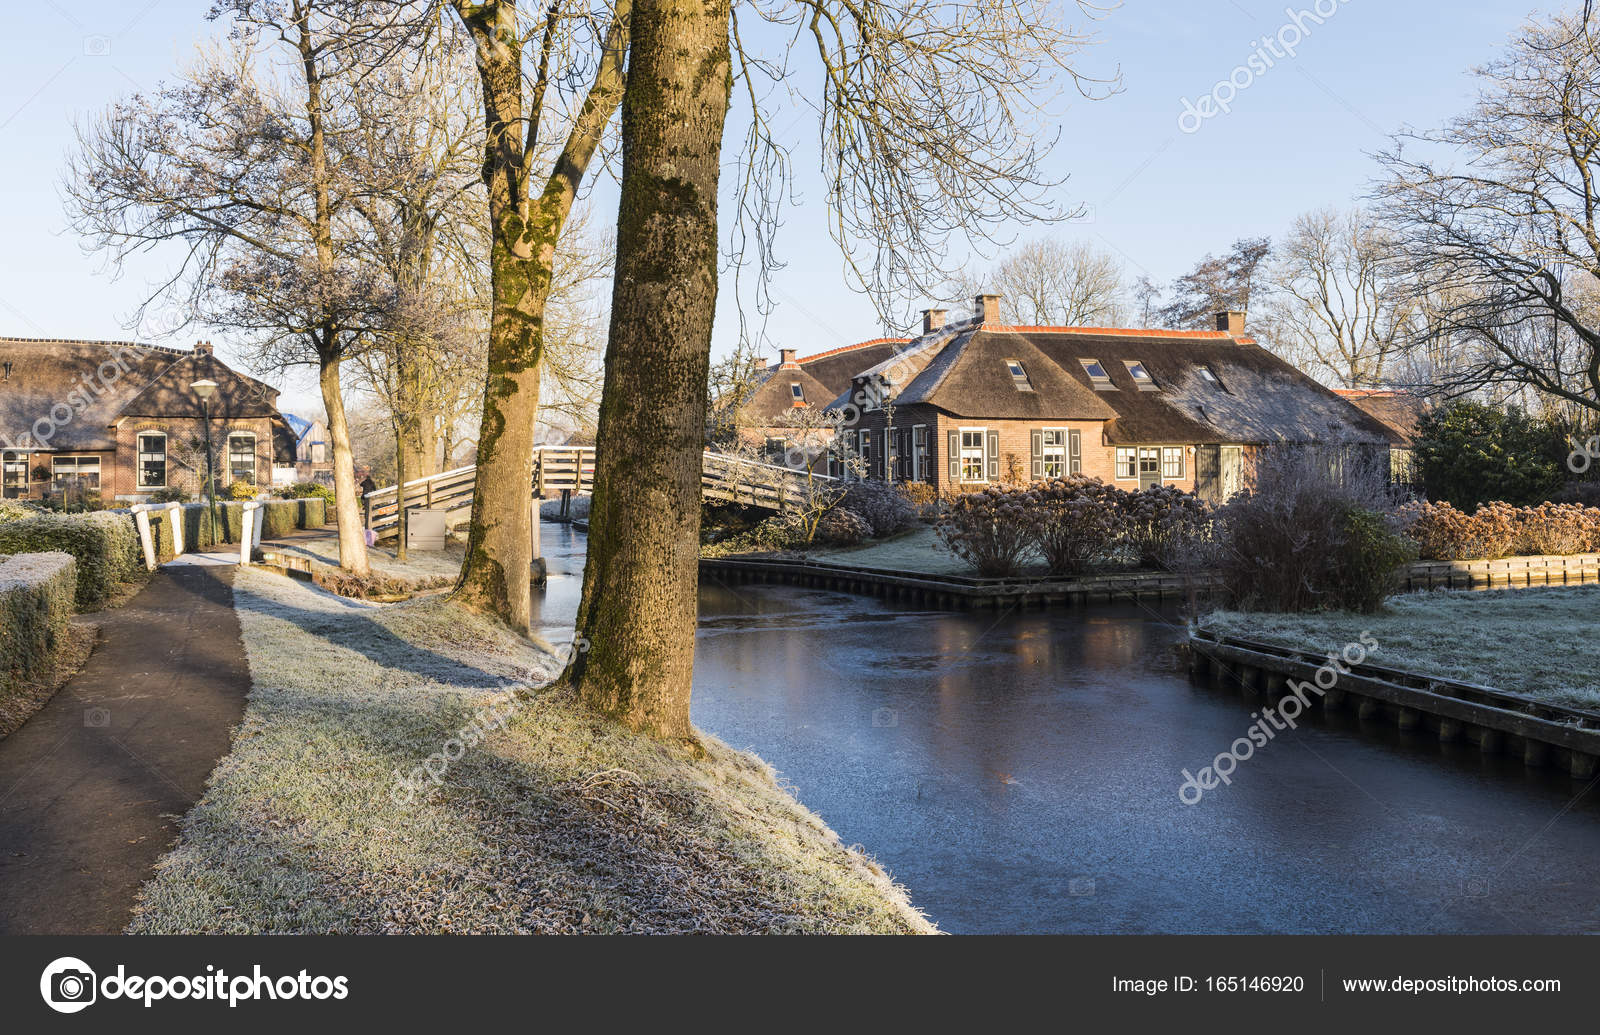 Winter Morning In Giethoorn Netherlands Stock Photo C Kloeg008